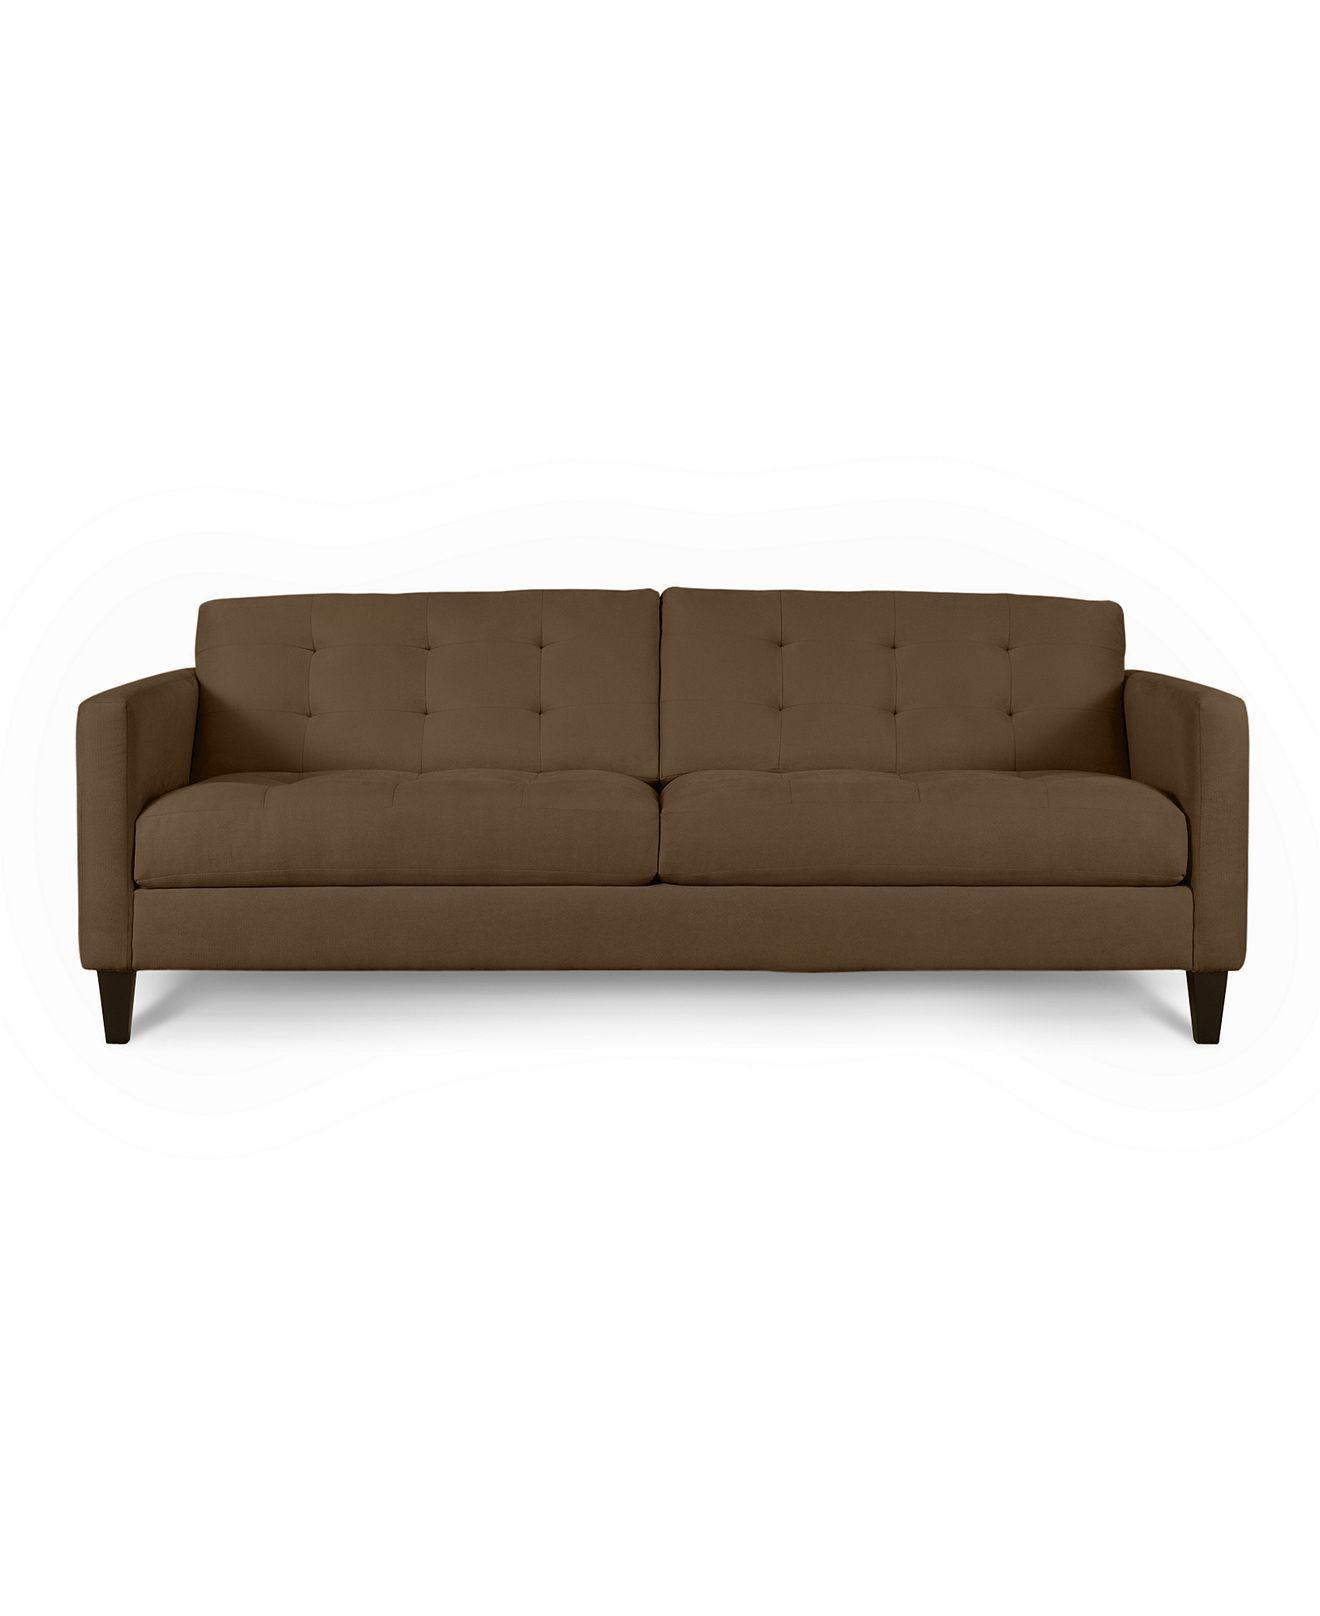 macy s orange sectional sofa baxton studio rhett convertible wish this one was a morgan fabric 87 8 quotw